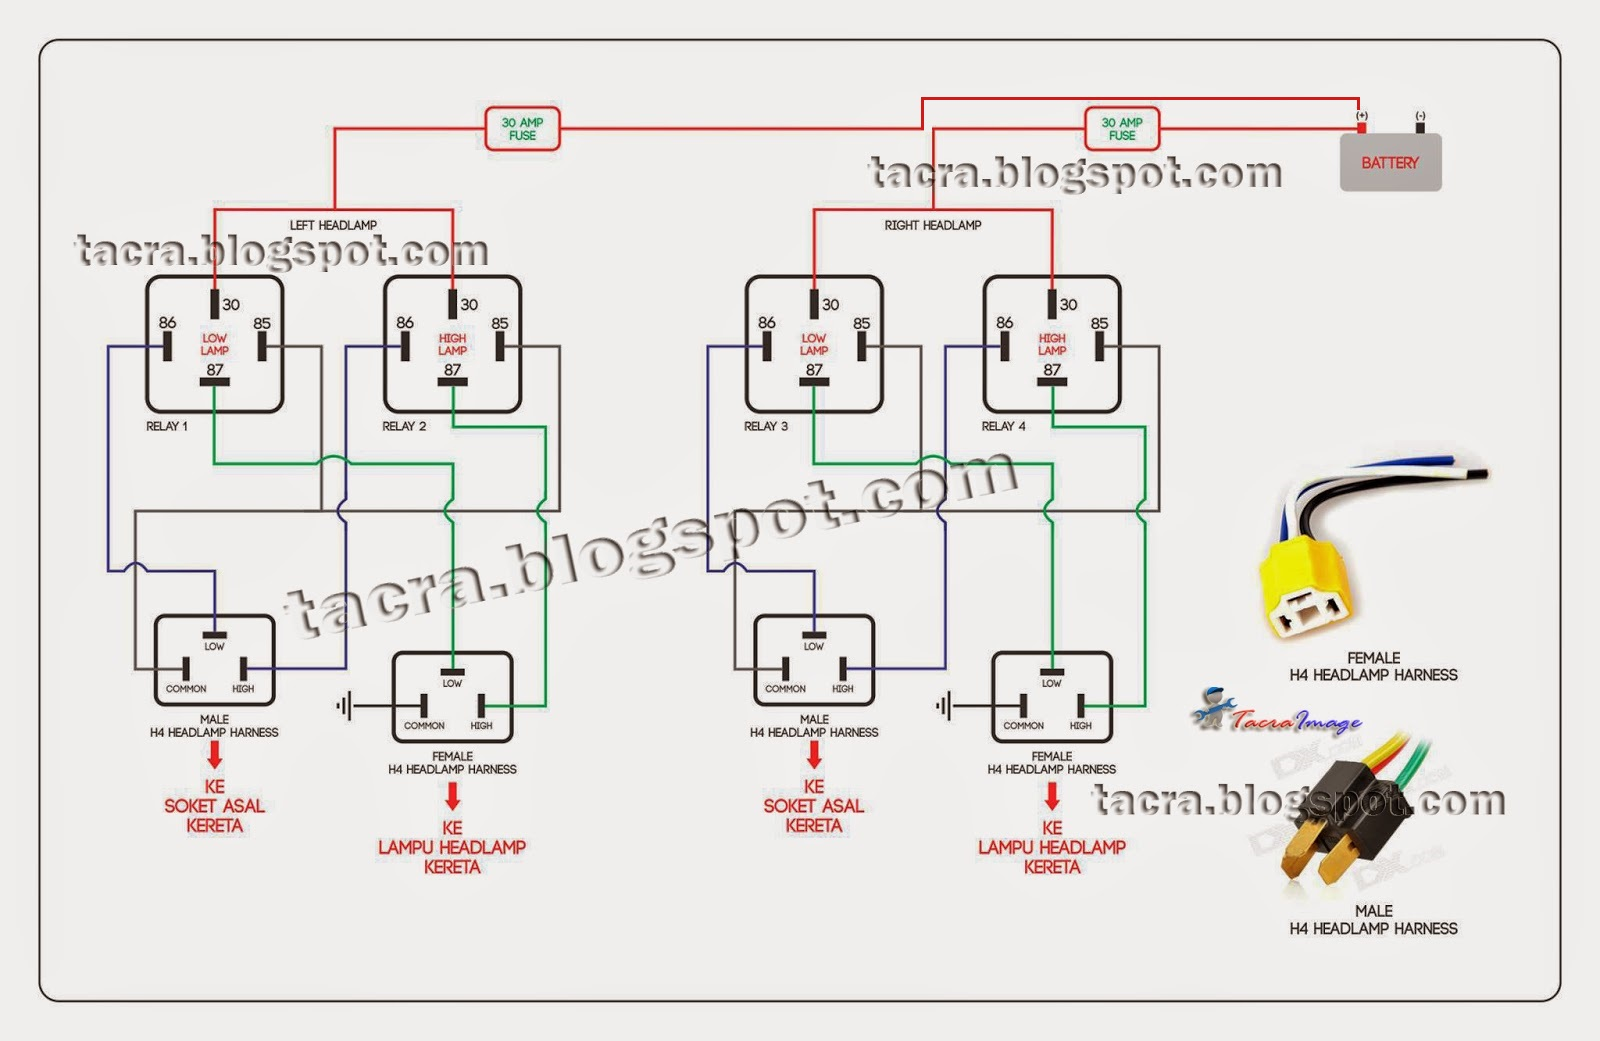 Saga Fuse Diagram Free Wiring For You Home Box Proton Schematic Diagrams Rh 44 Koch Foerderbandtrommeln De Electrical